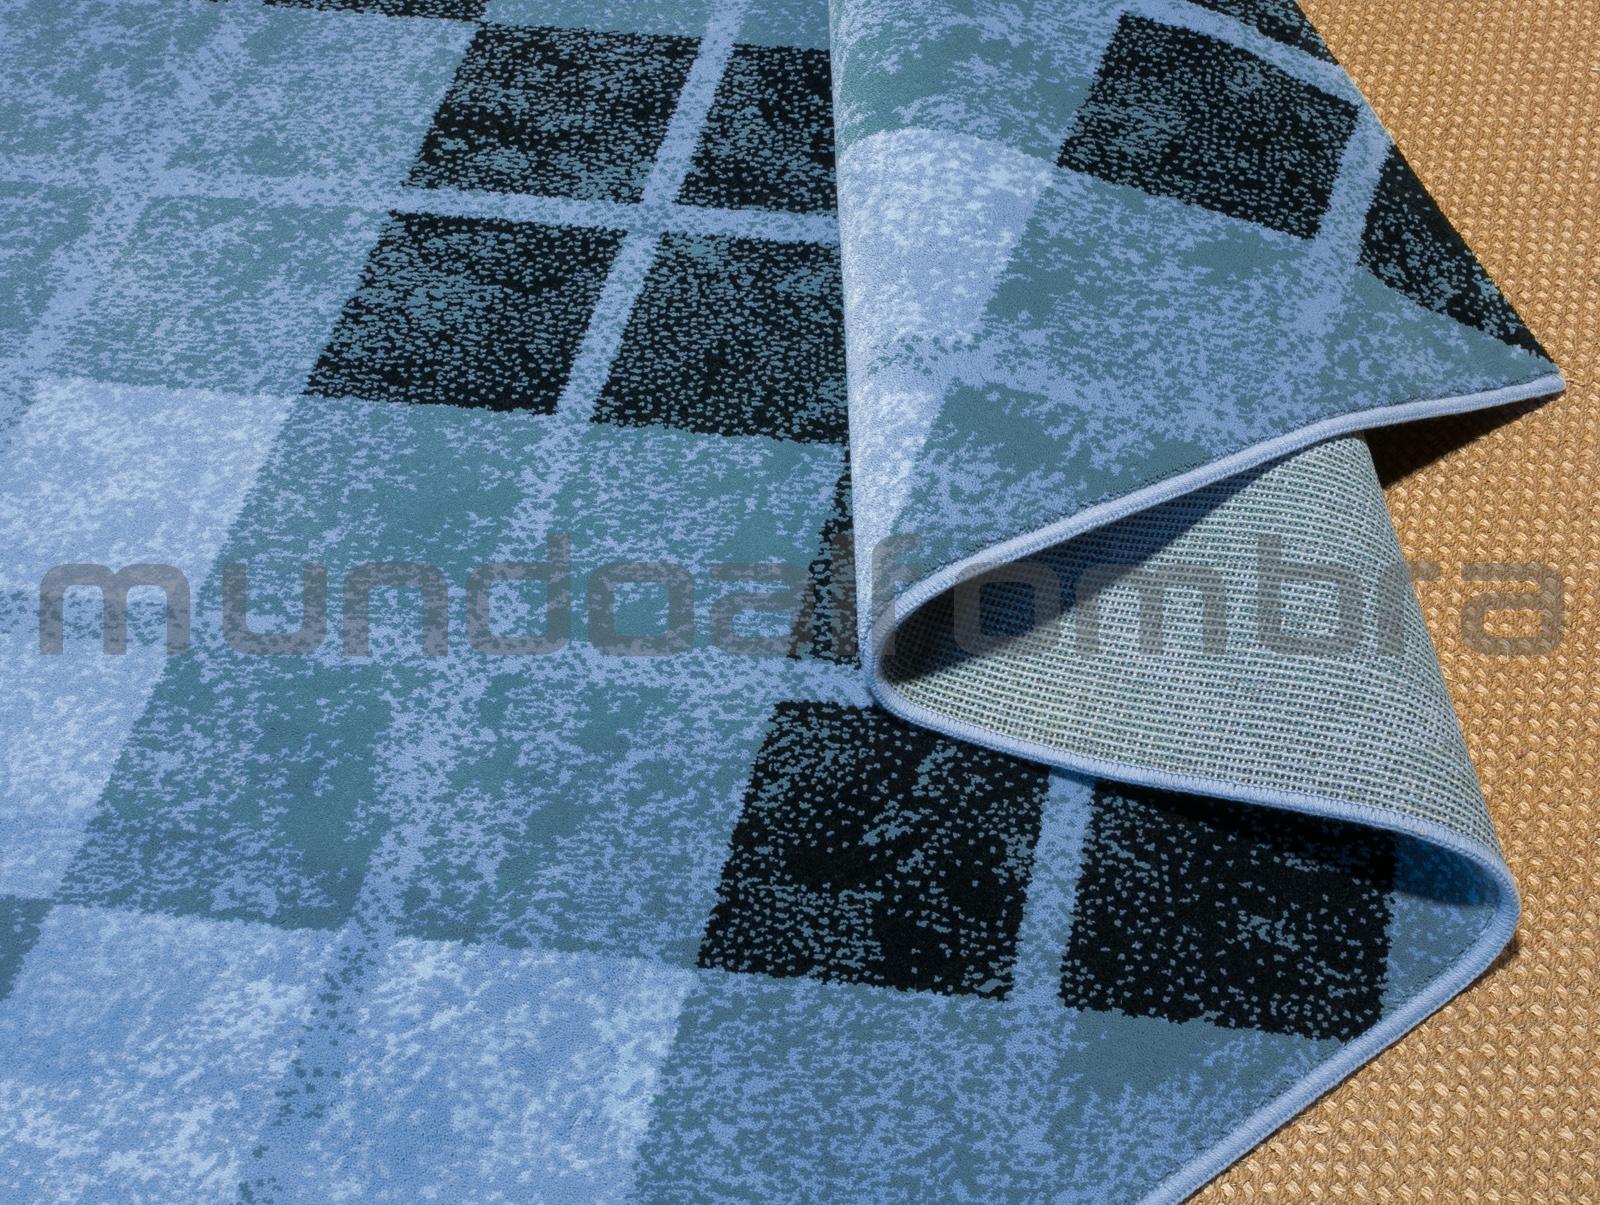 alfombra fibras sintéticas mundoalfombra